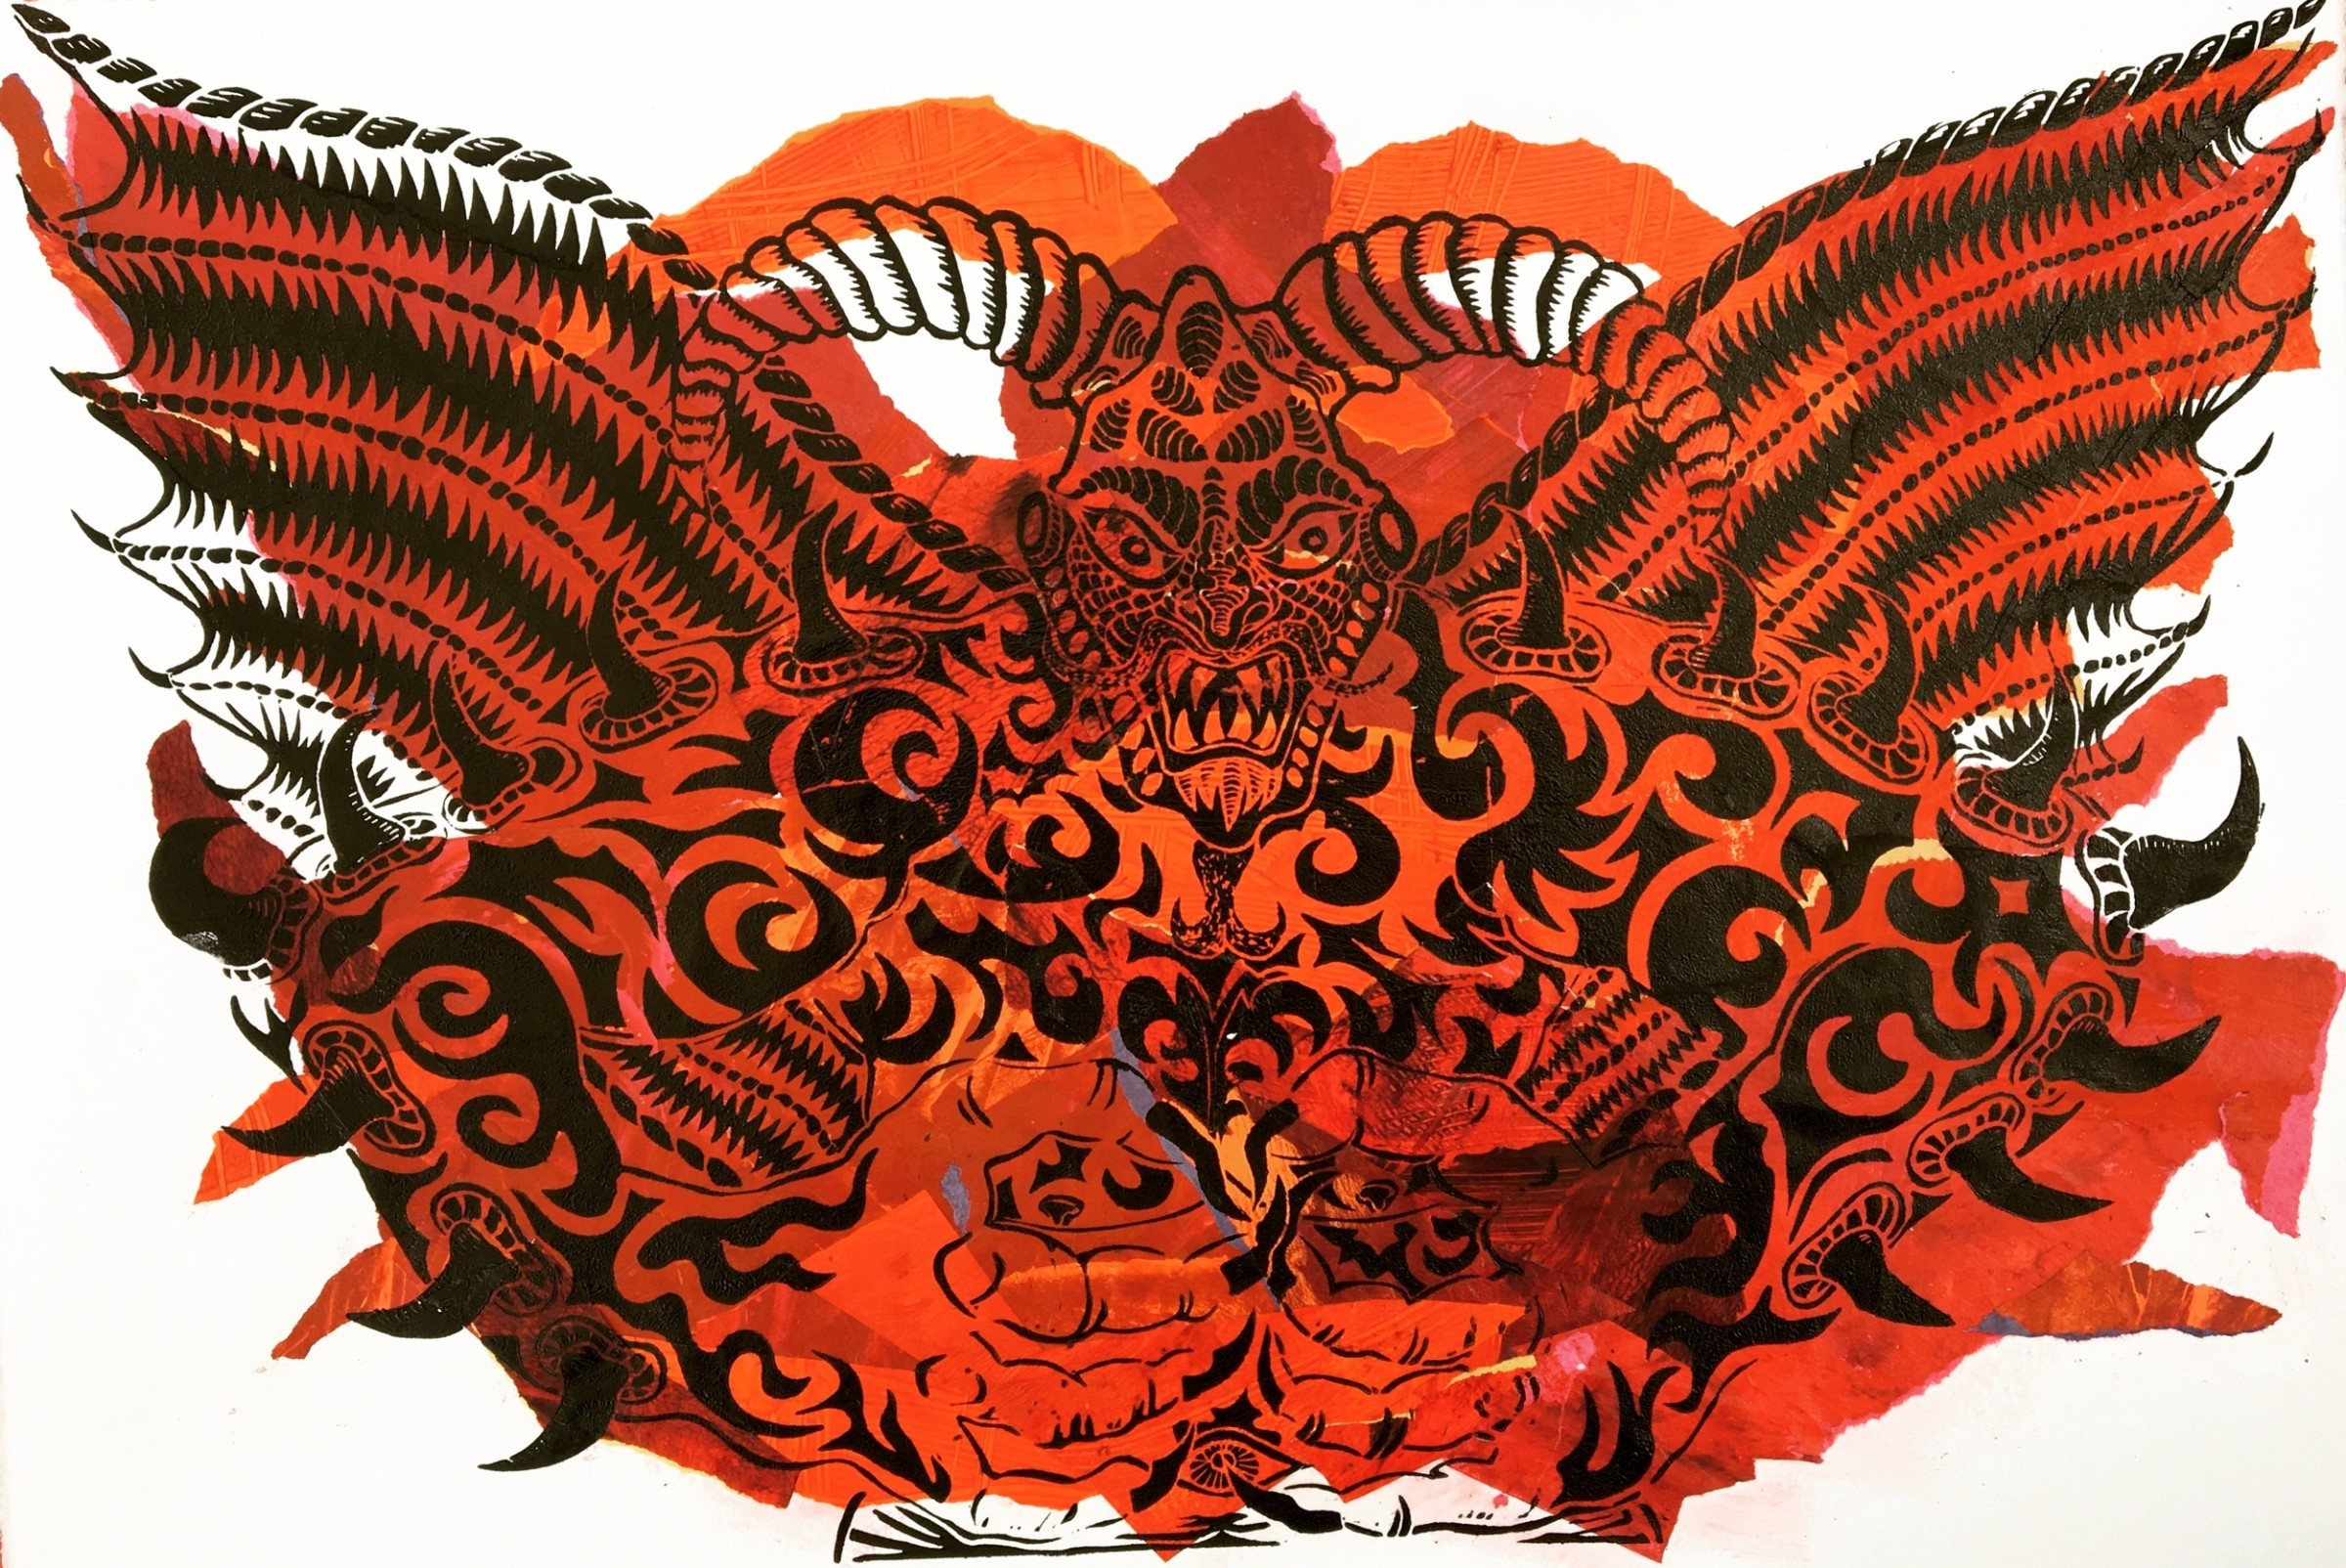 "<span class=""link fancybox-details-link""><a href=""/artists/67-fernando-feijoo-re/works/10345/"">View Detail Page</a></span><div class=""artist""><span class=""artist""><strong>Fernando Feijoo RE</strong></span></div><div class=""title""><em>Lucifer</em></div><div class=""medium"">linocut & collage</div><div class=""dimensions"">40 x 60cm framed</div><div class=""price"">£250.00</div>"